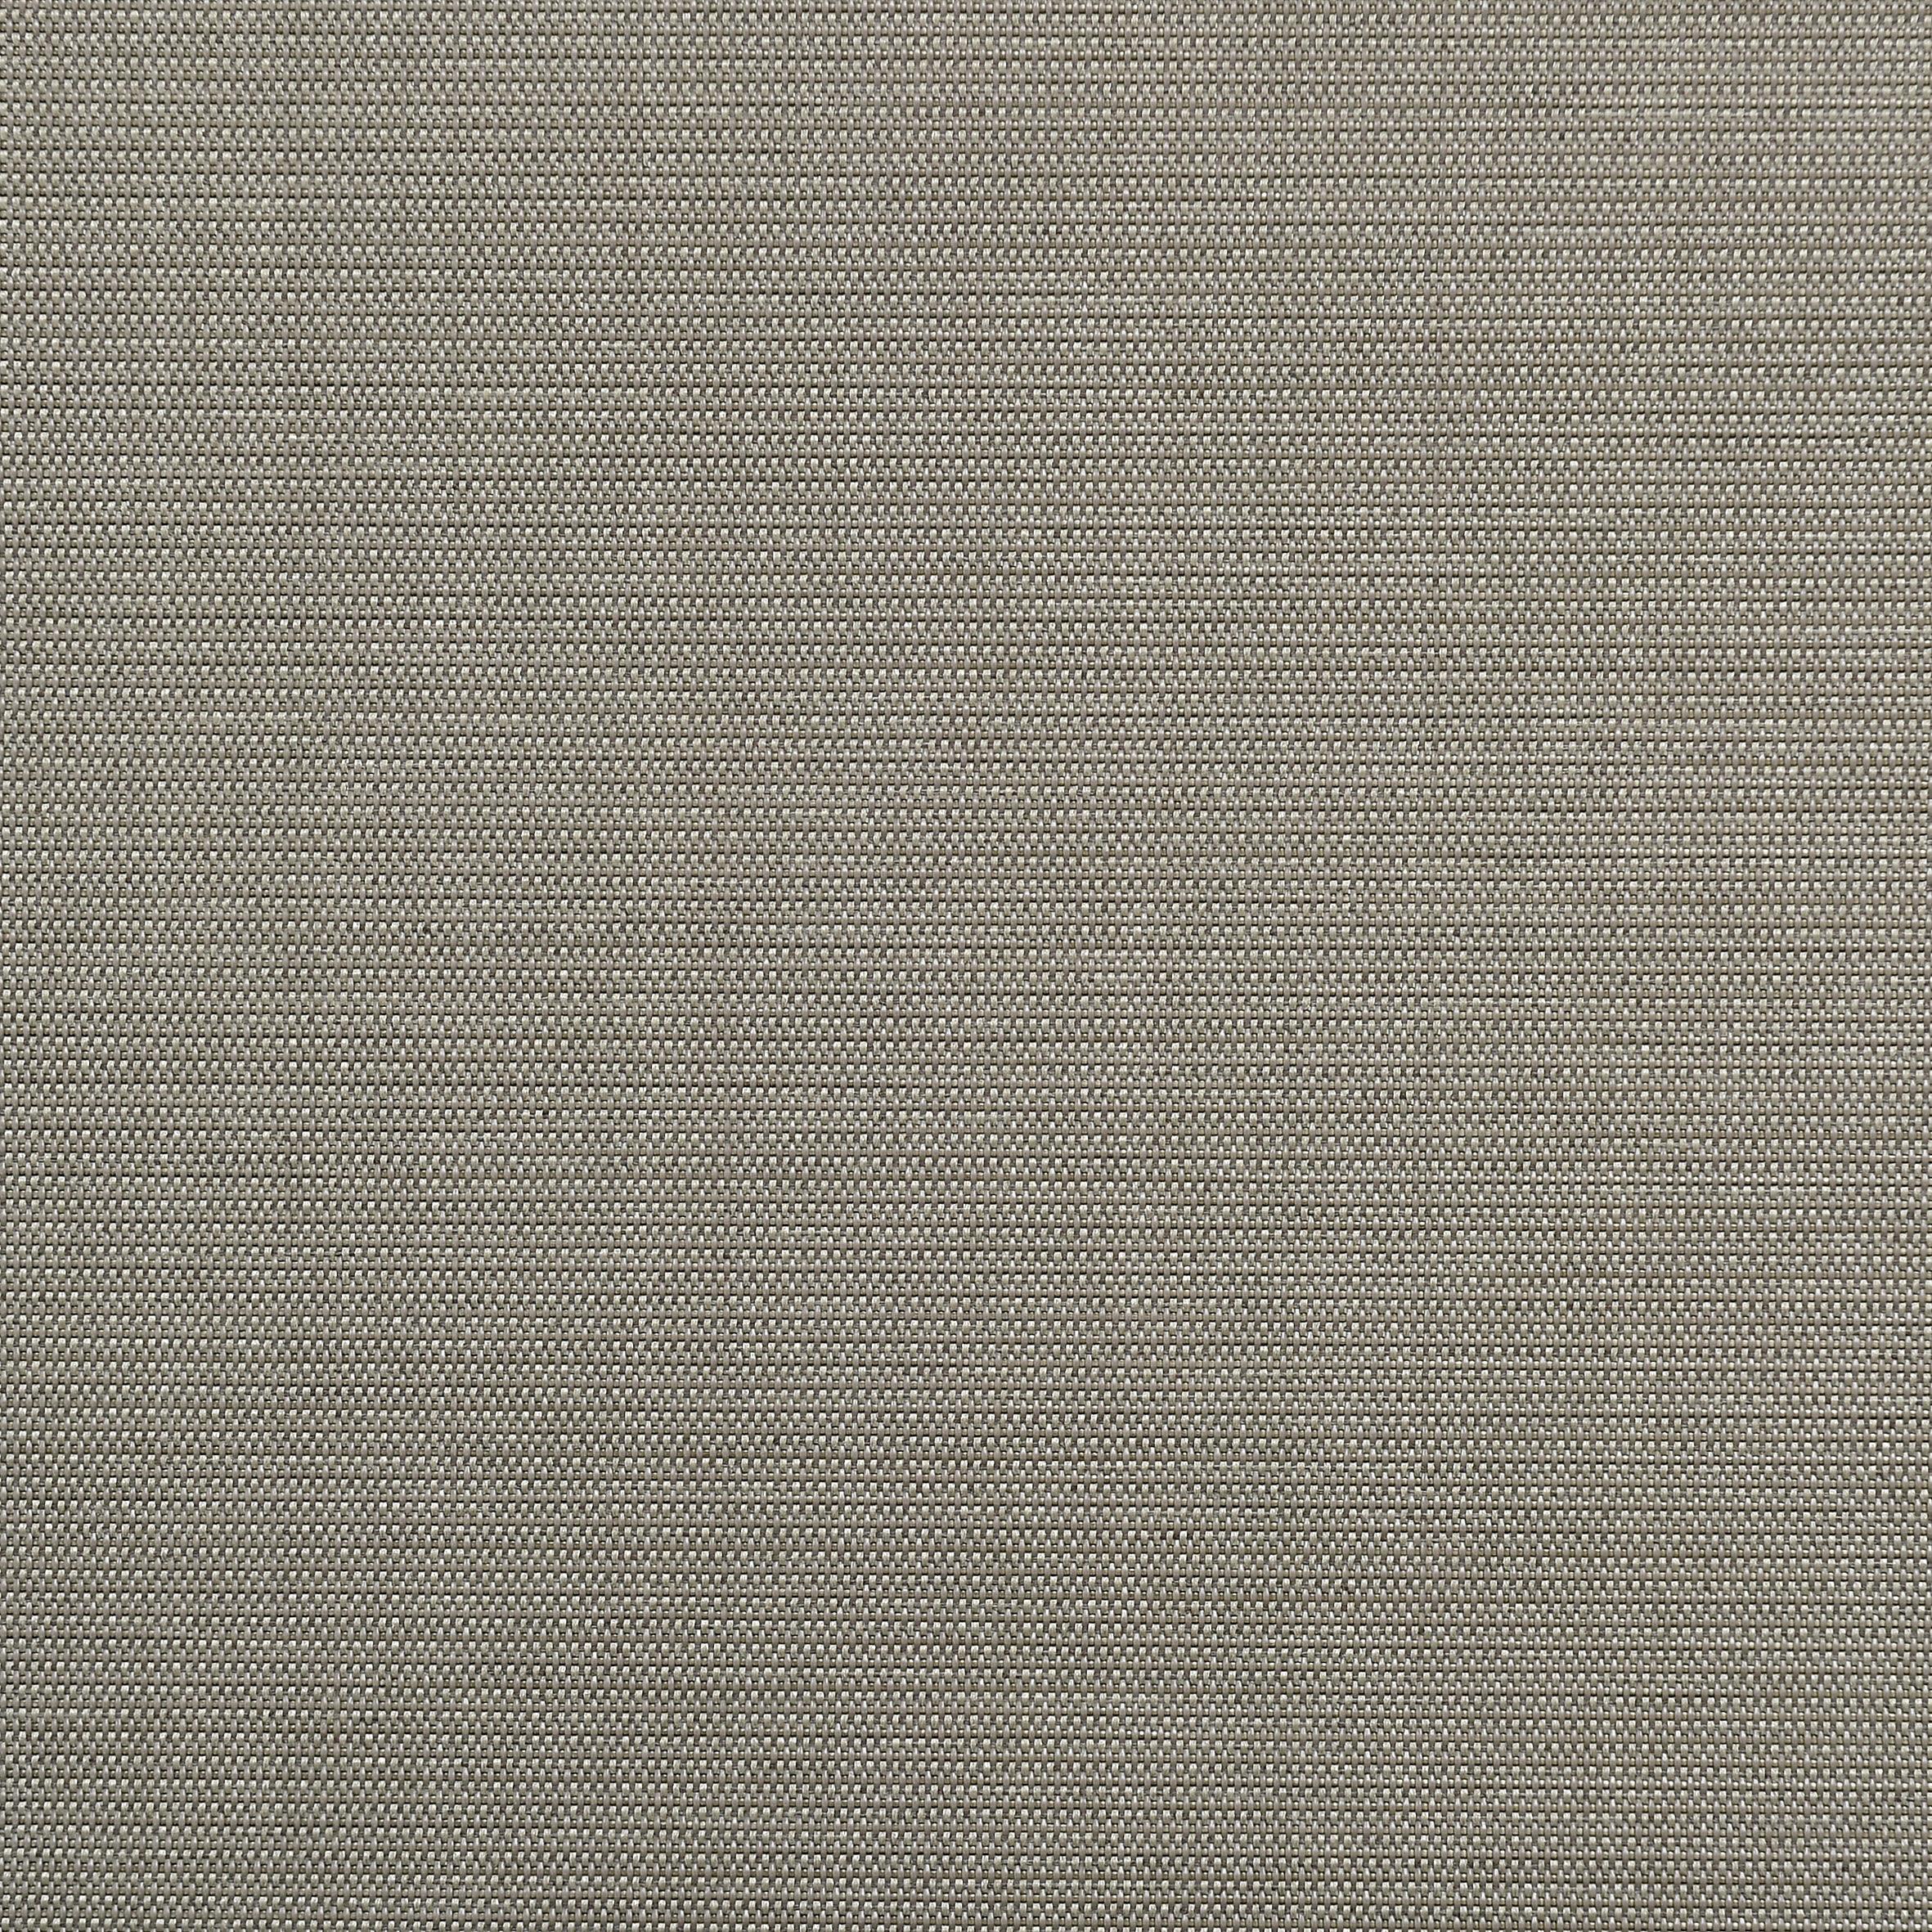 Gartenstuhl ESPANYOL (4 Stk) 03